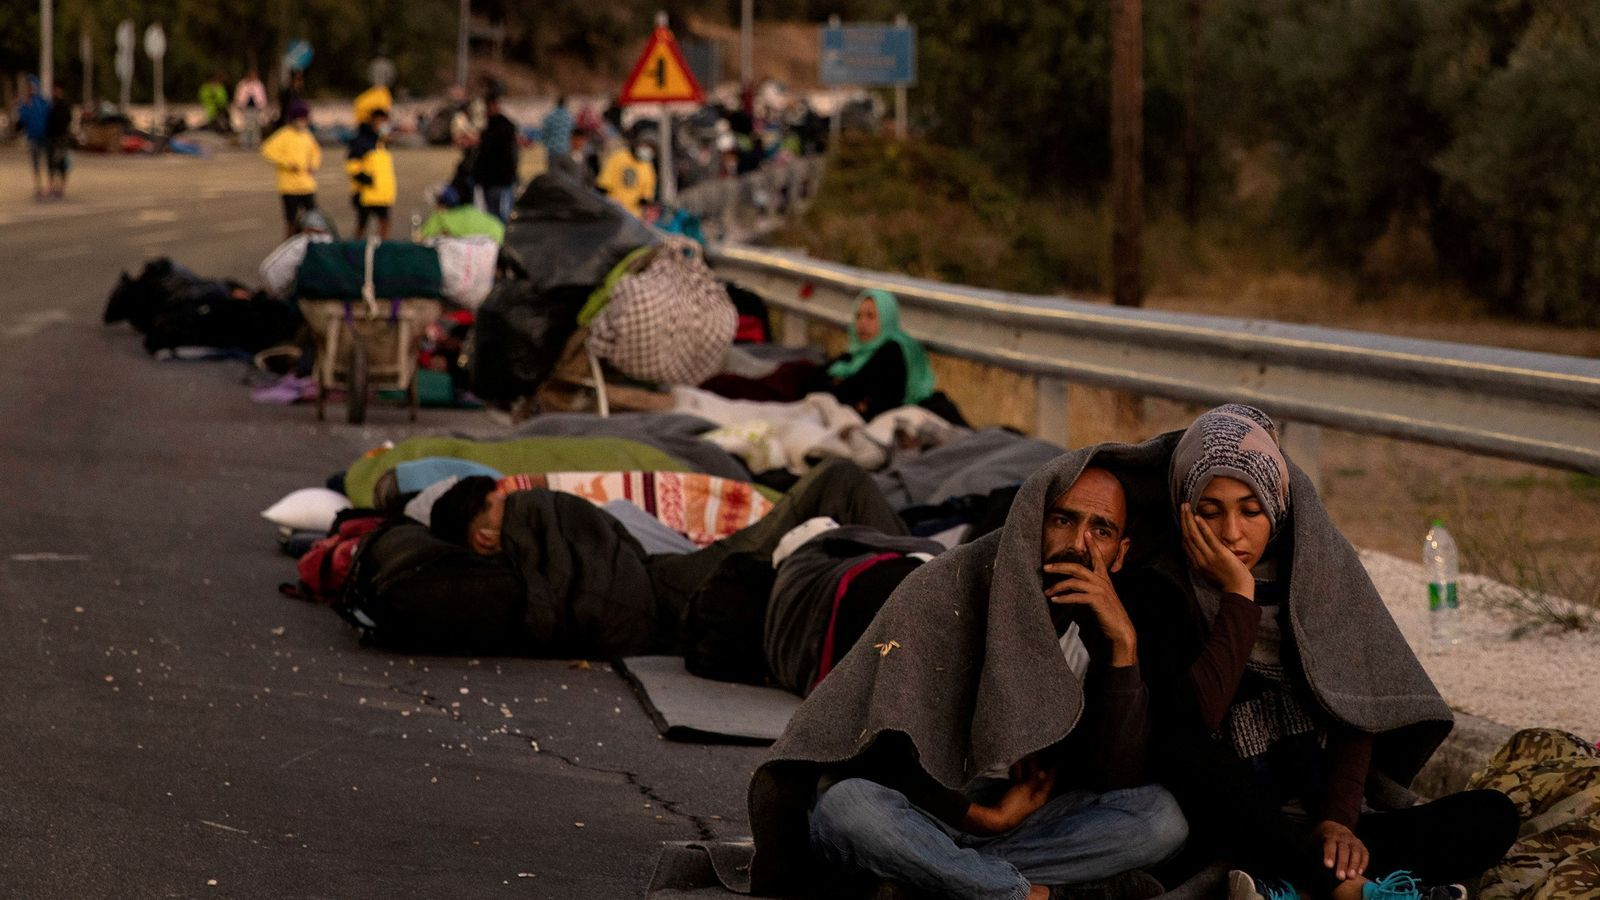 ANÀLISI: Més política simbòlica (Blanca Garcés. CIDOB)